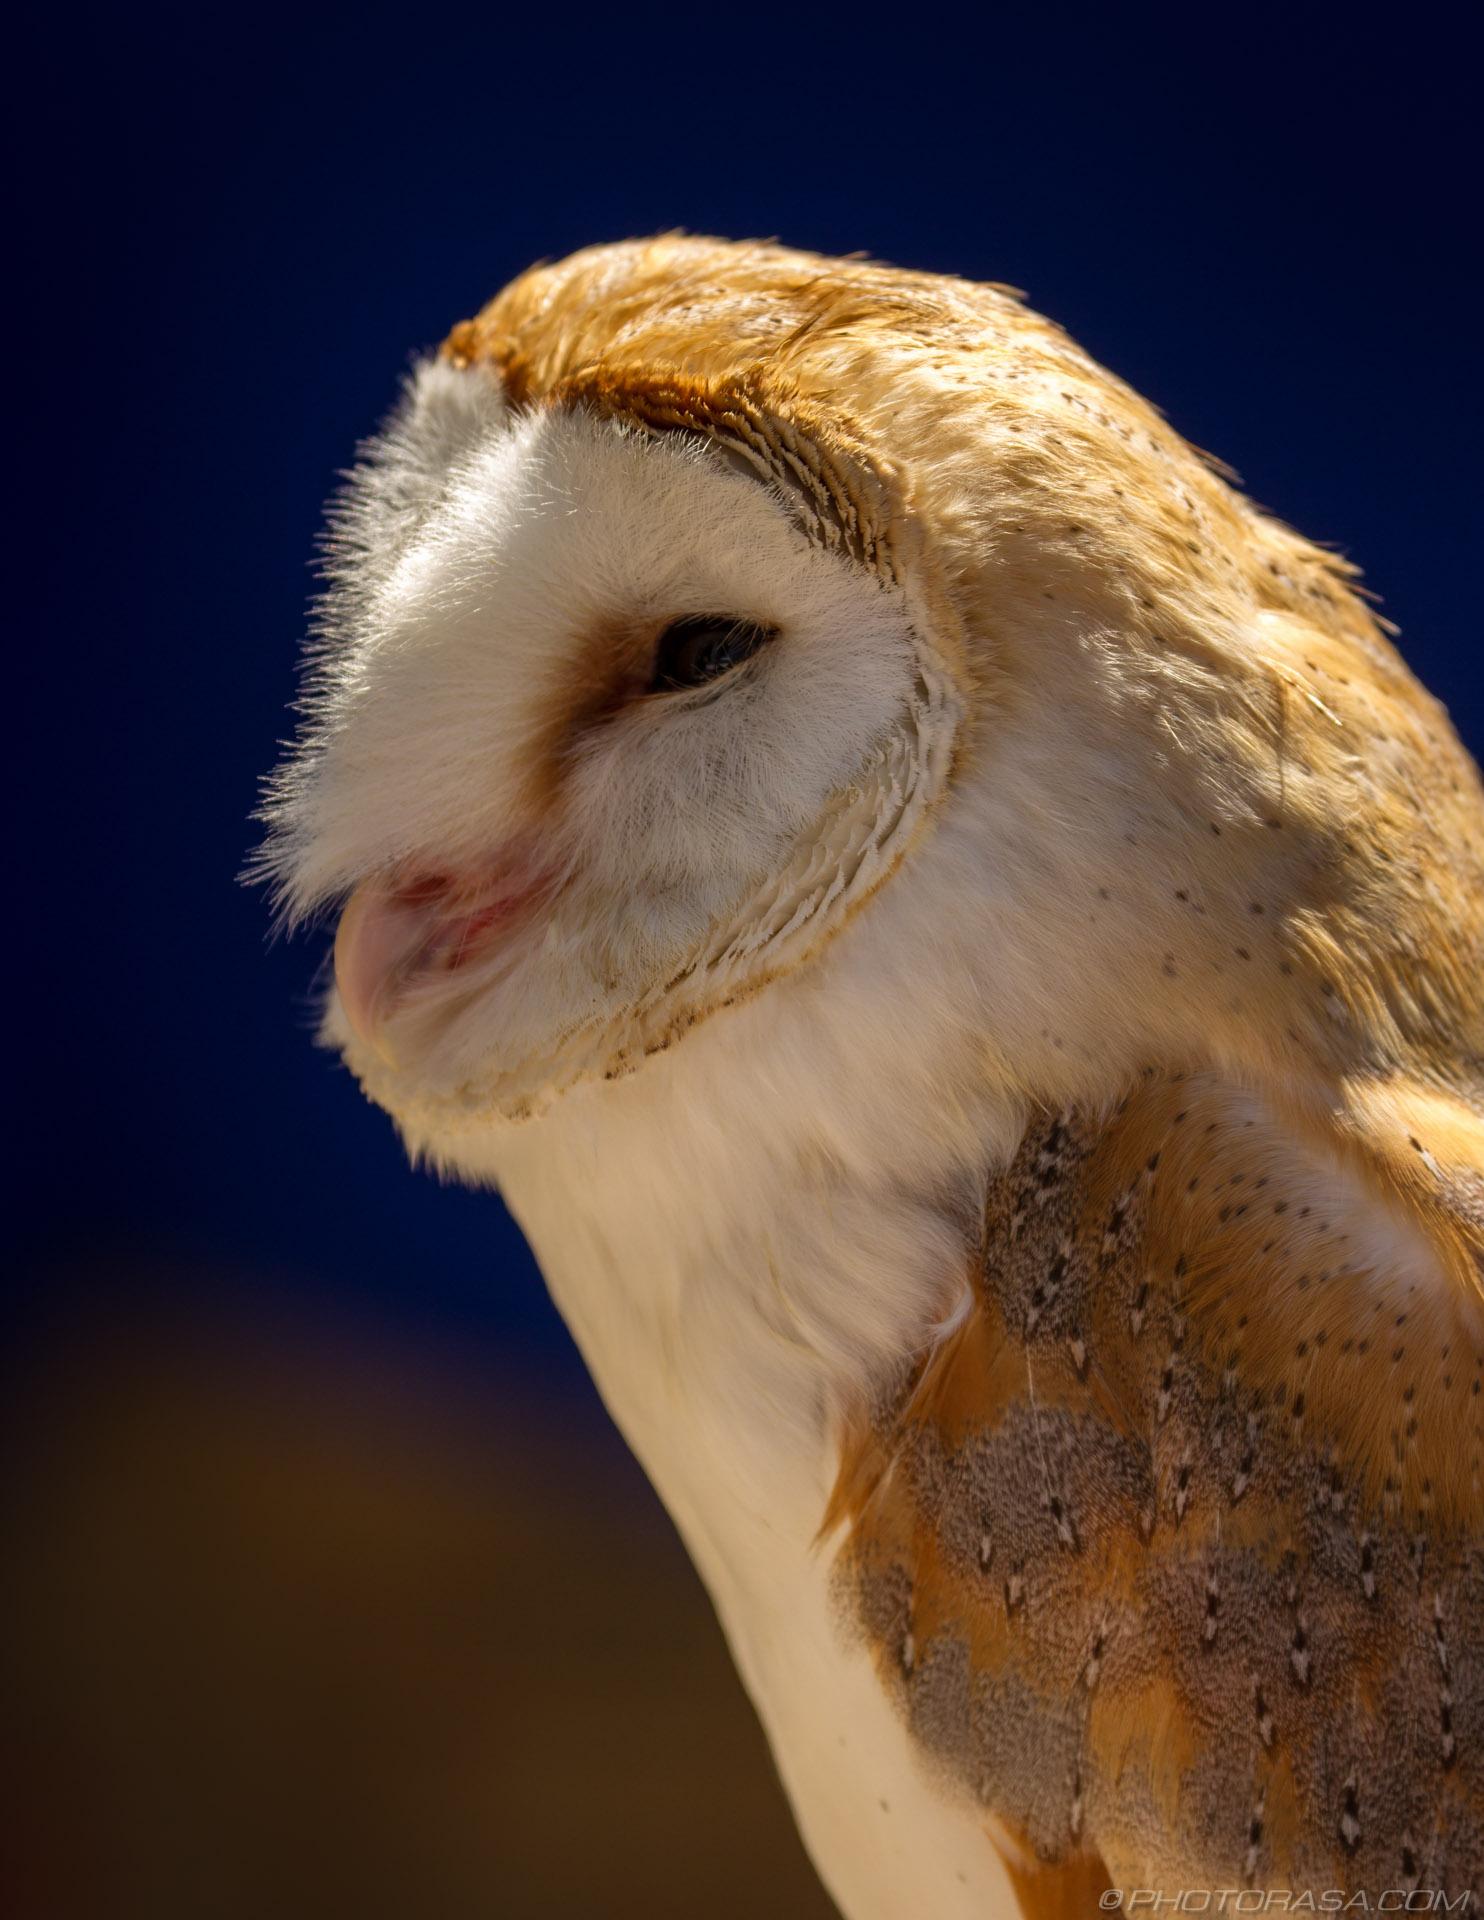 https://photorasa.com/owls/barn-owl-2/